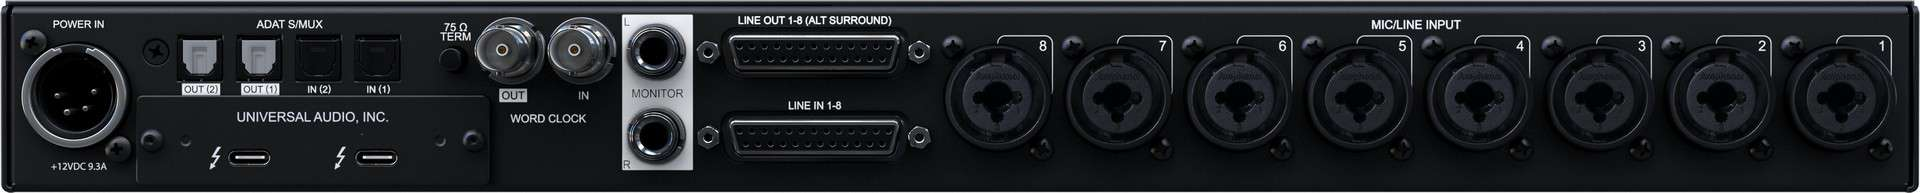 Universal Audio Apollo x8p Test: Tolles Thunderbolt Interface